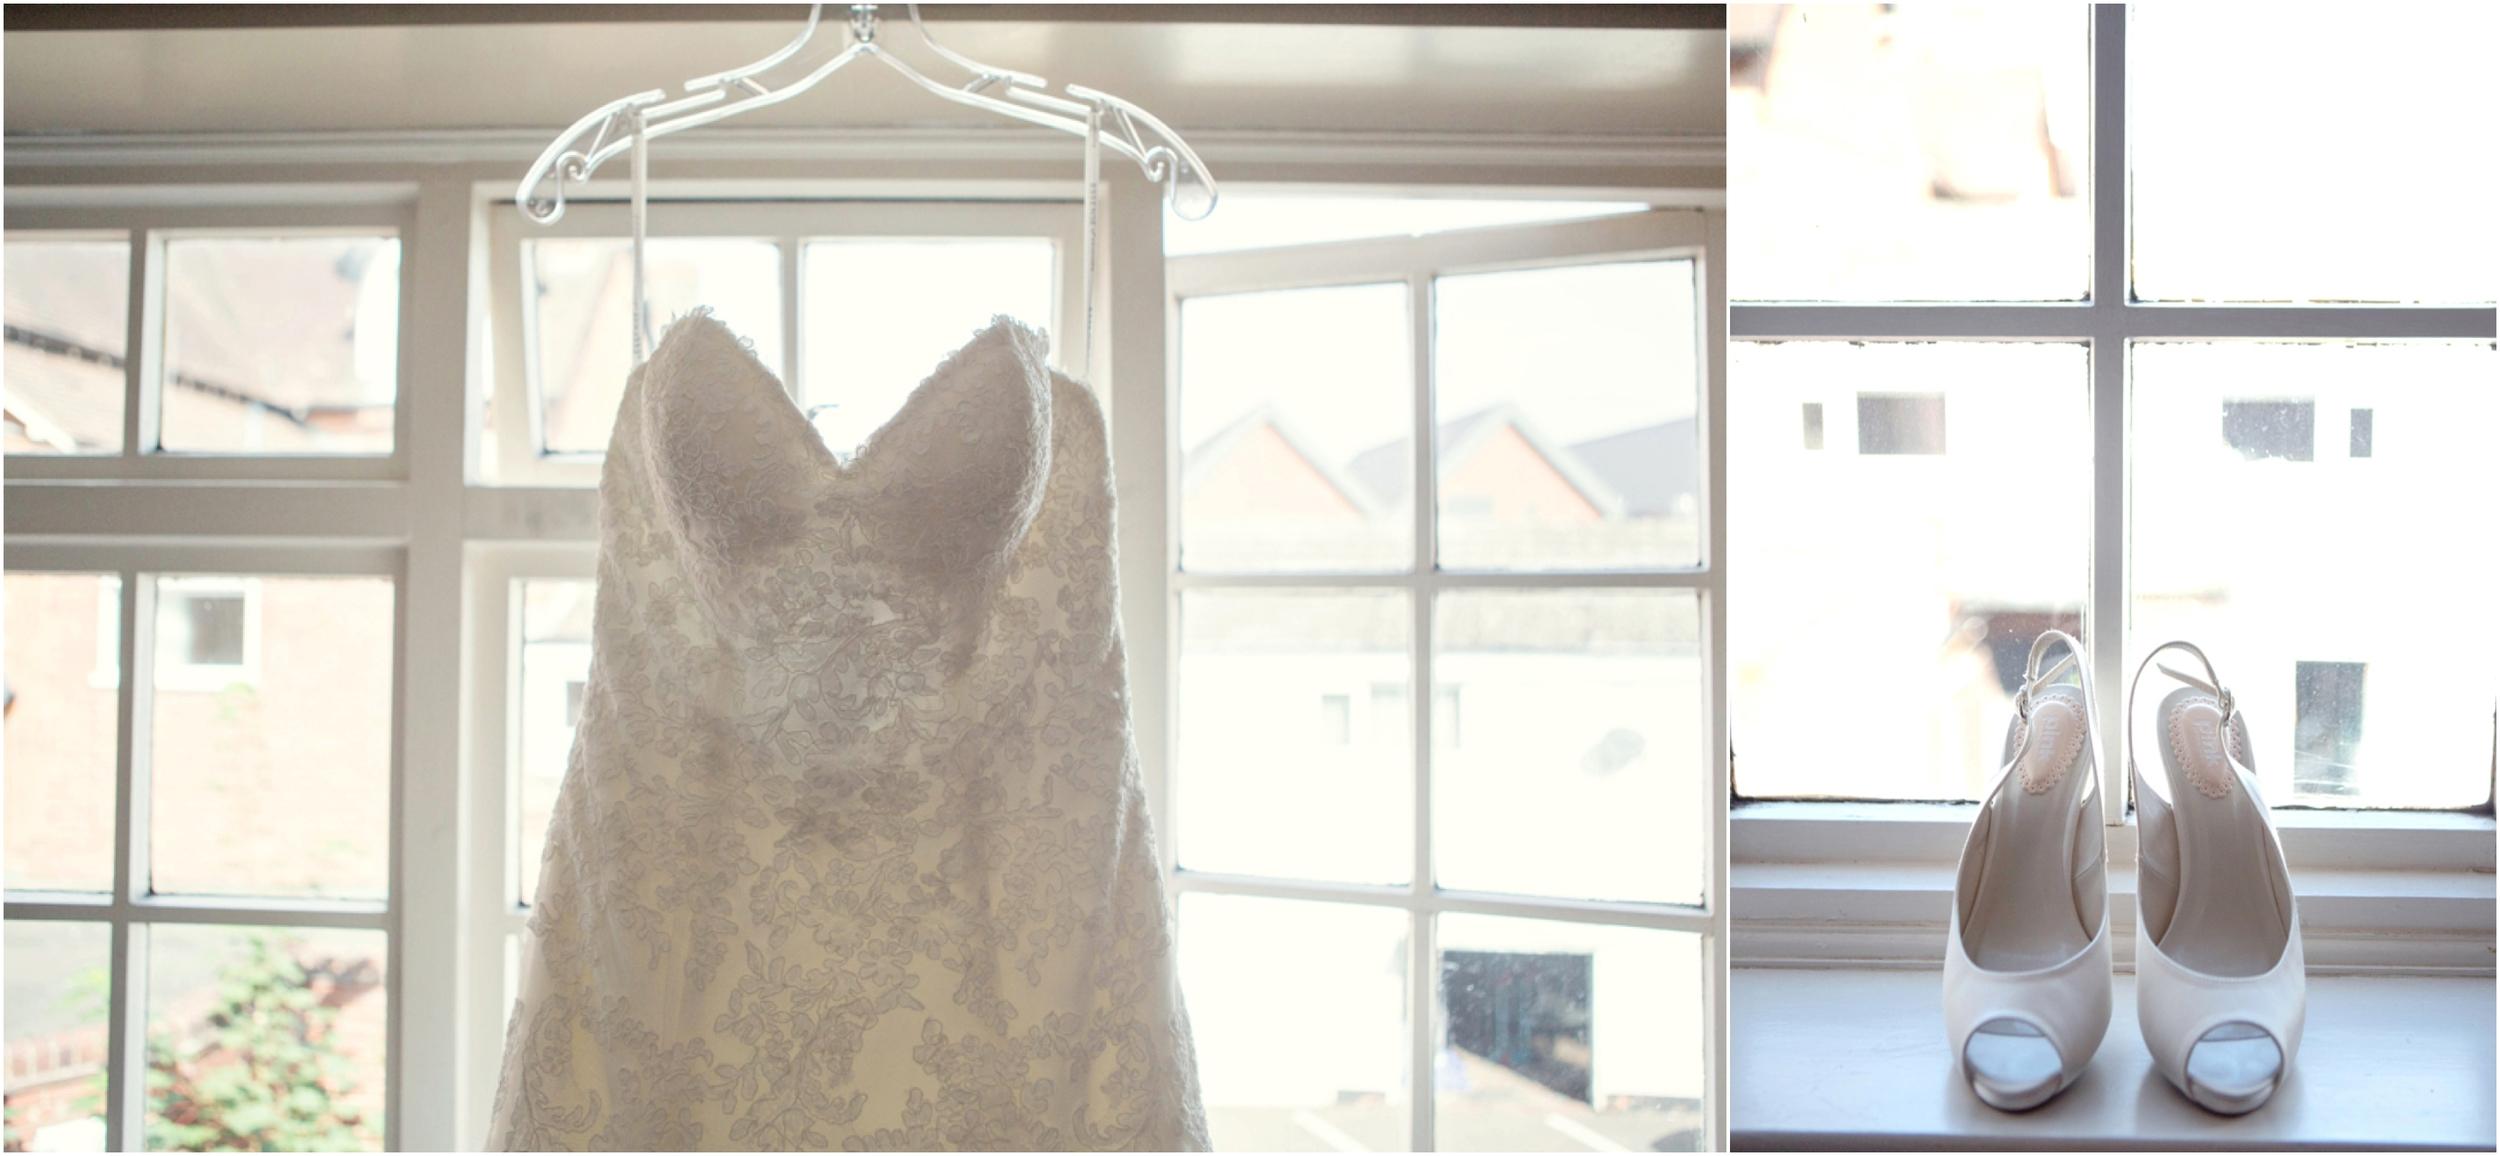 Sophie Evans Photography, Warwickshire Wedding Photography, Welcombe Hotel .jpg